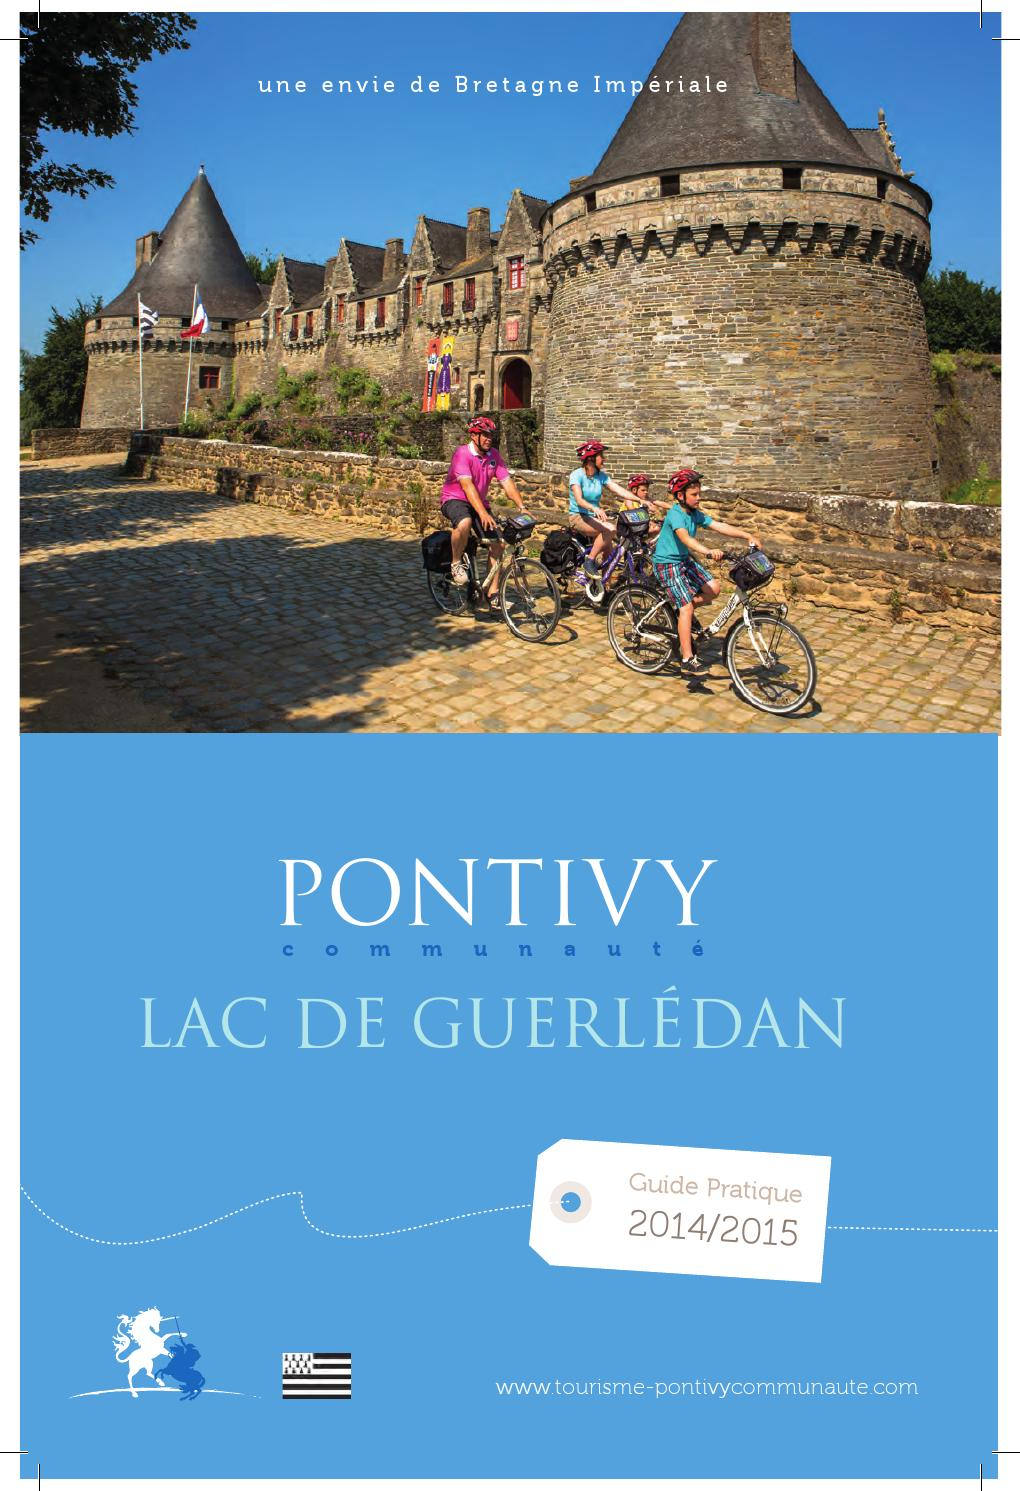 Guide pratique 2014 2015 by office de tourisme pontivy communaut issuu - Office de tourisme pontivy ...